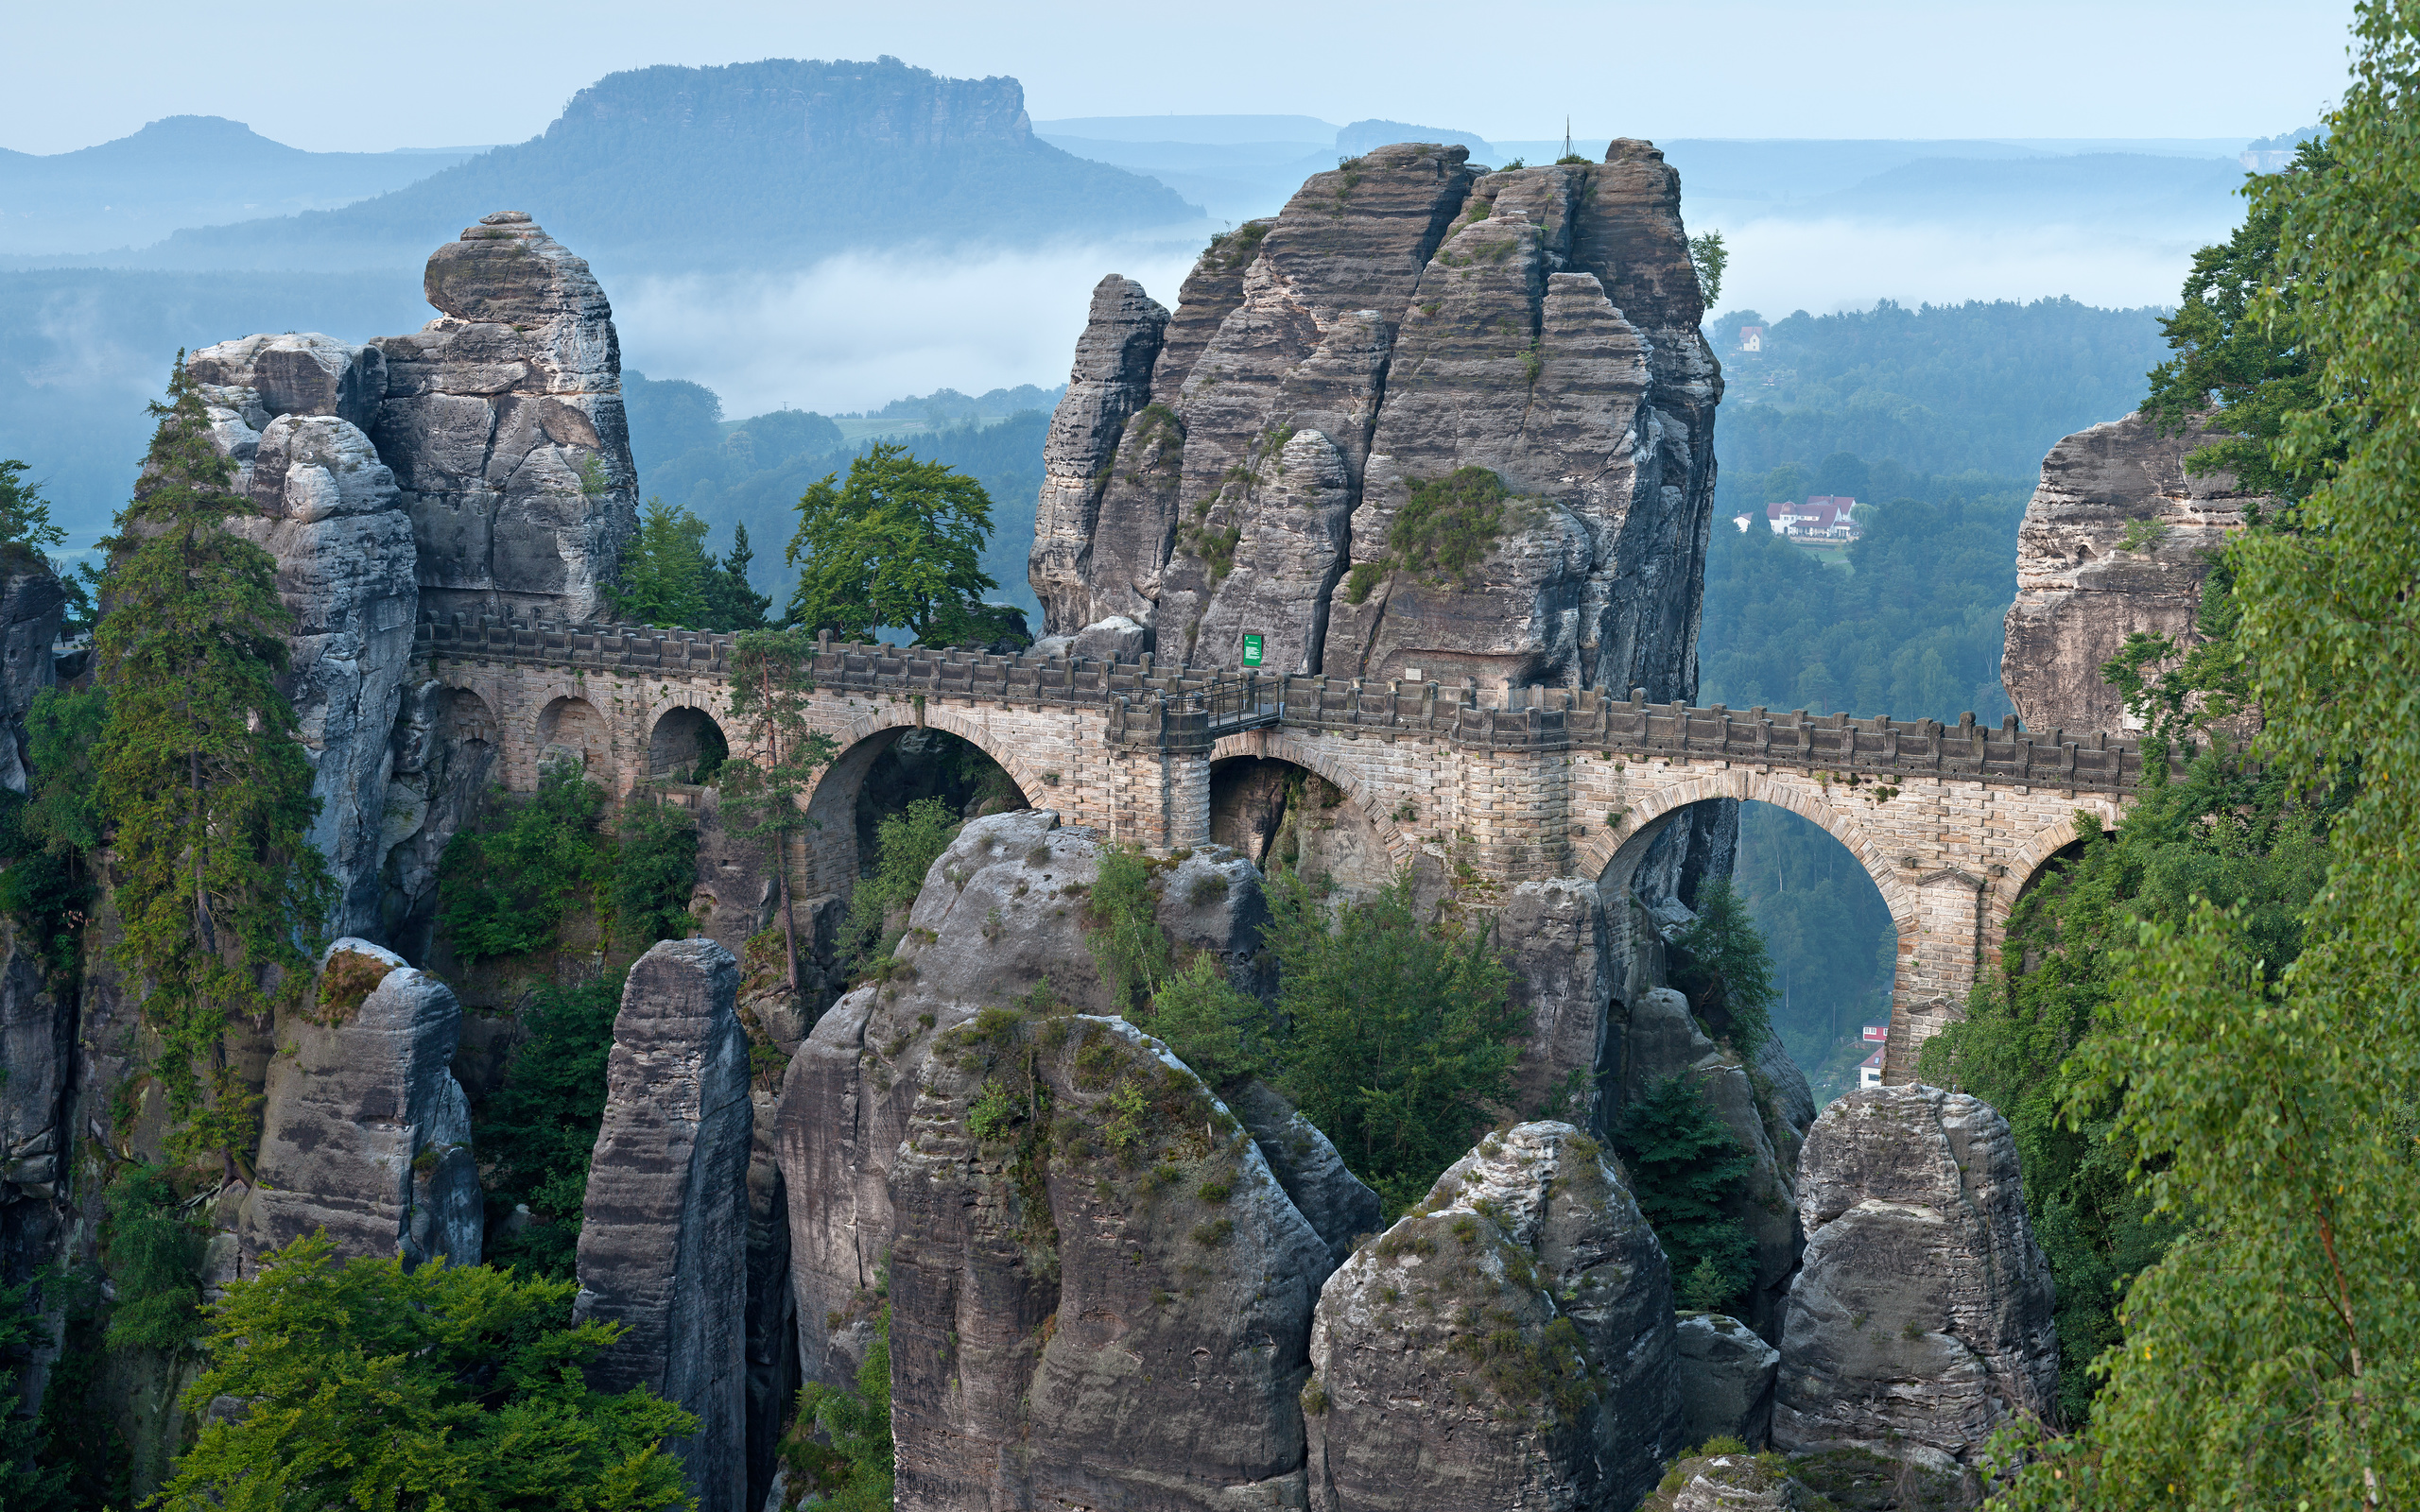 германия, мост, basta bridge, gorge marterella, saxon switzerland, скала, природа, утес